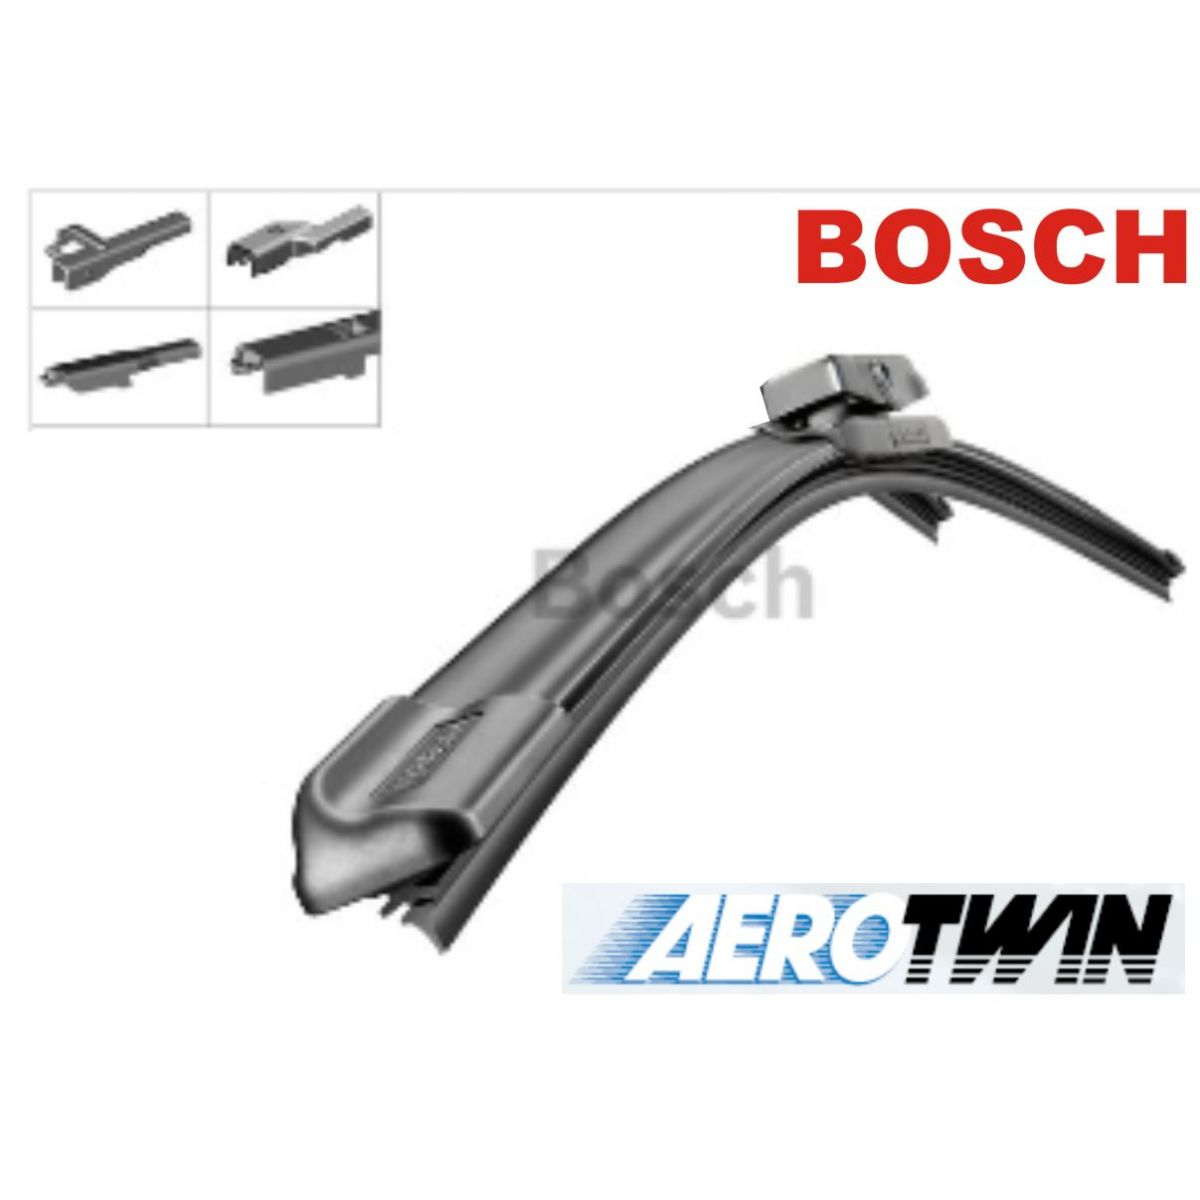 Palheta Bosch Aerotwin Plus Limpador de para brisa Bosch AP 20 M - 500 MM